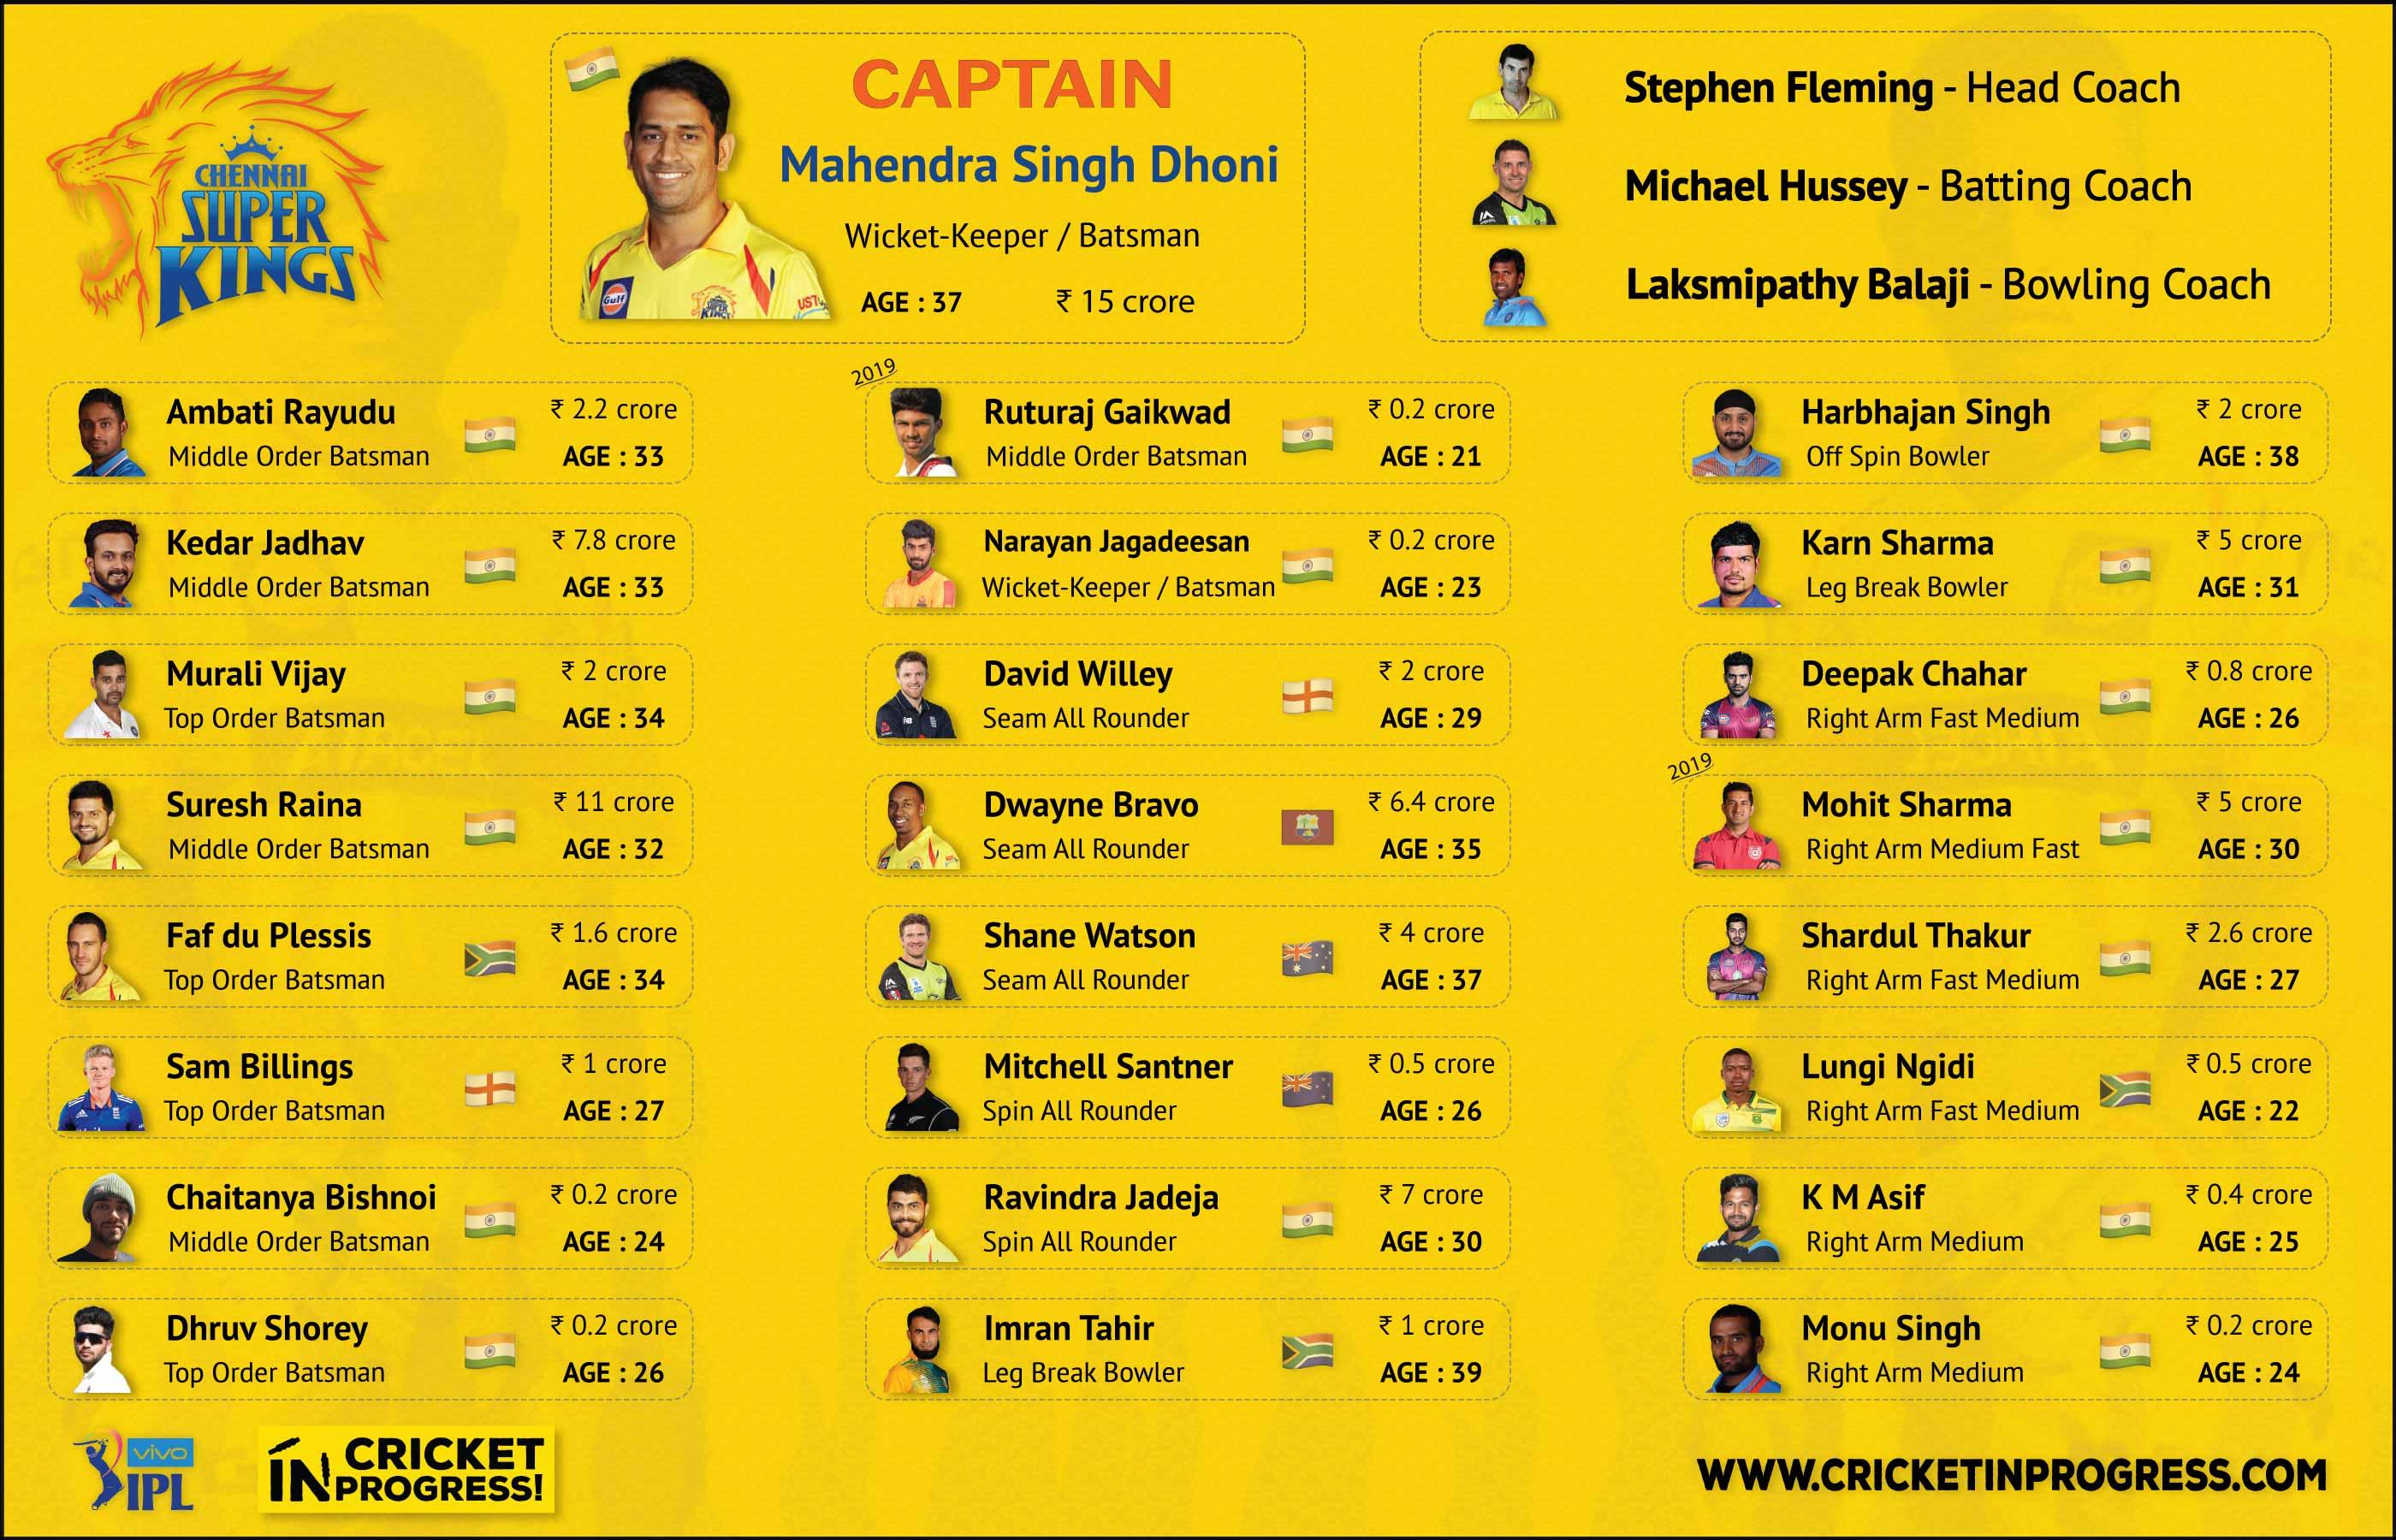 IPL 2019 CSK Roster